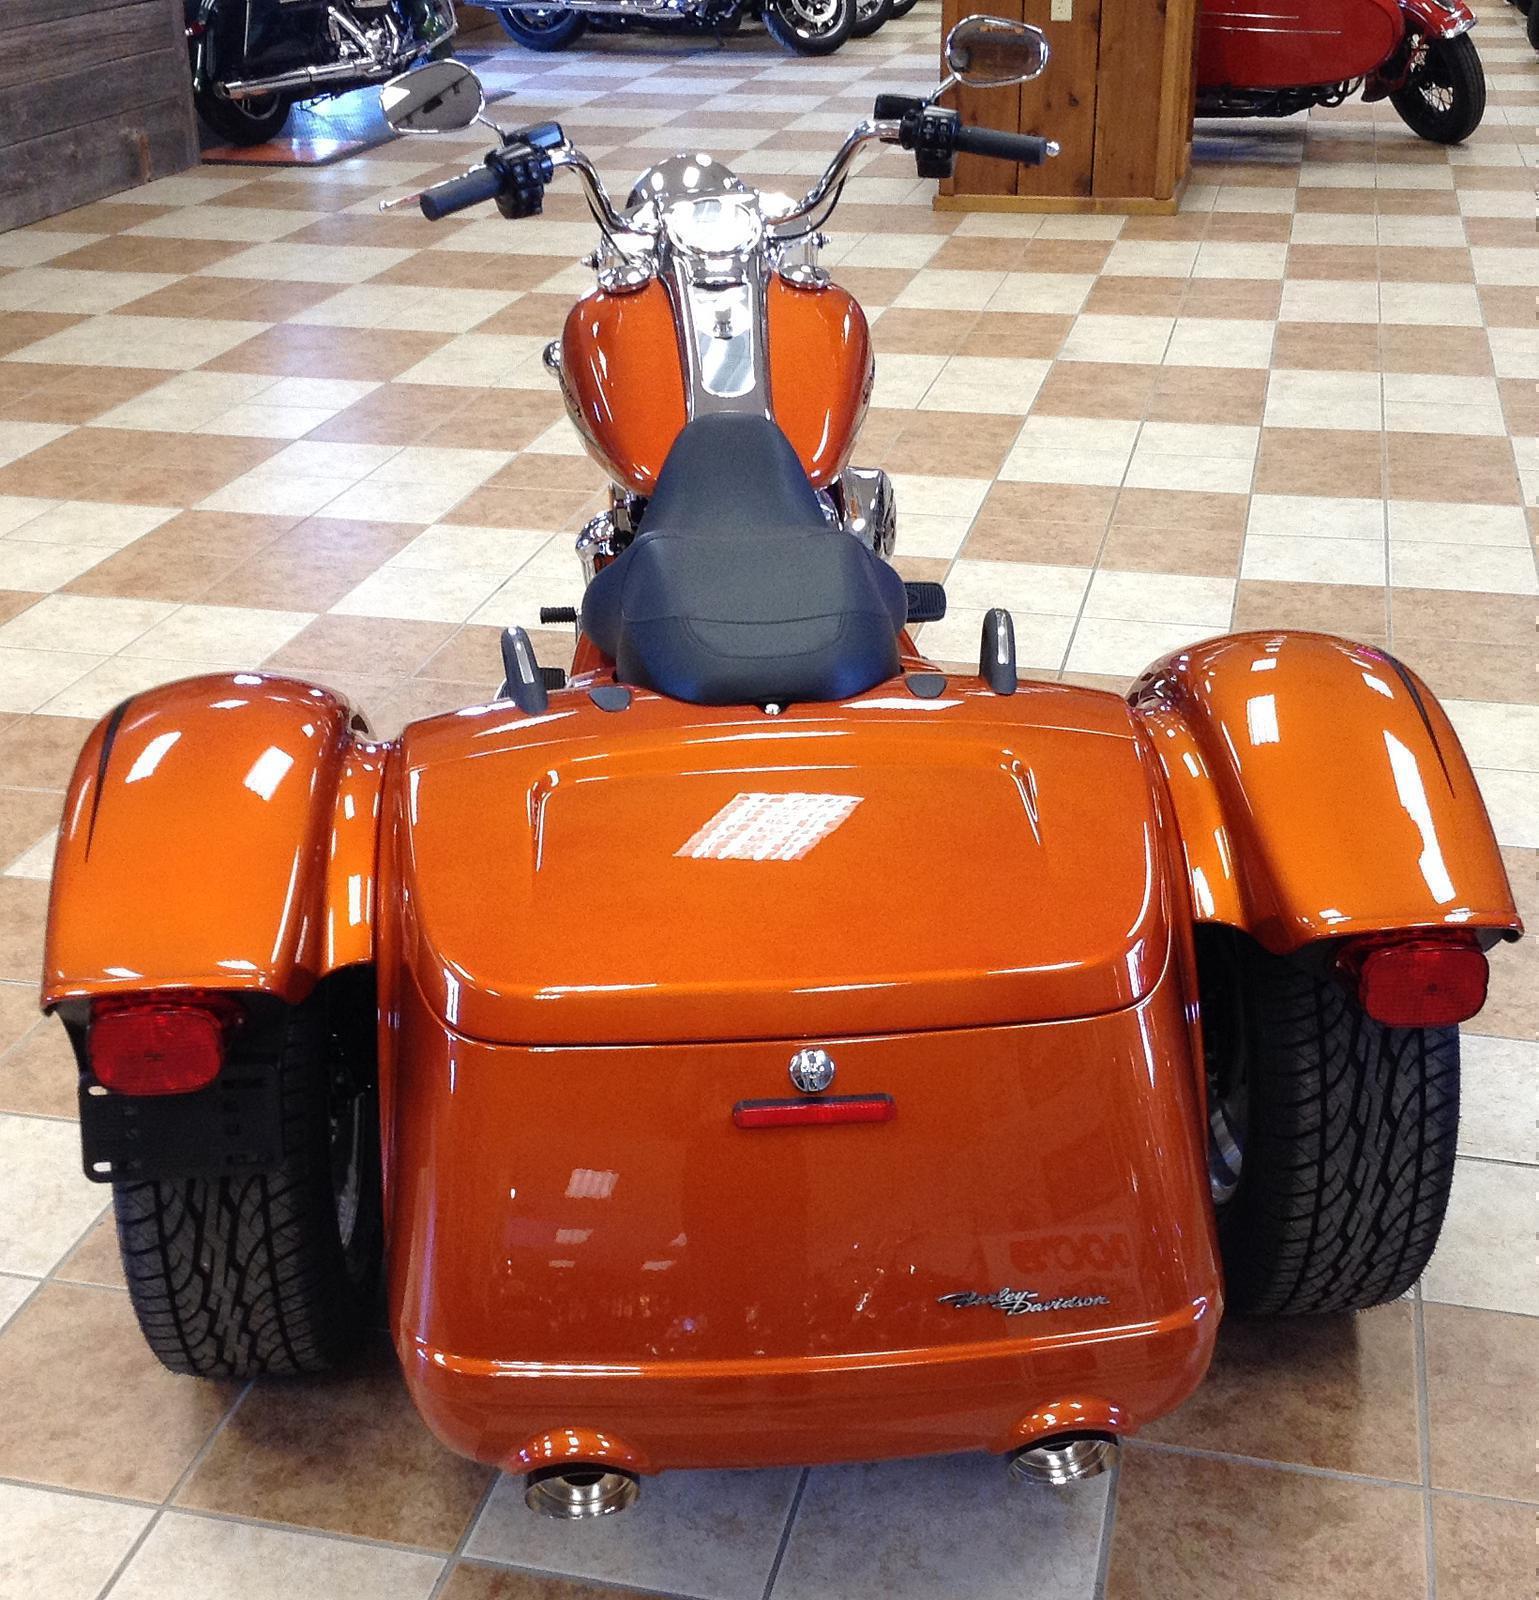 2019 Harley-Davidson® FLRT Freewheeler for sale in Bonduel, WI